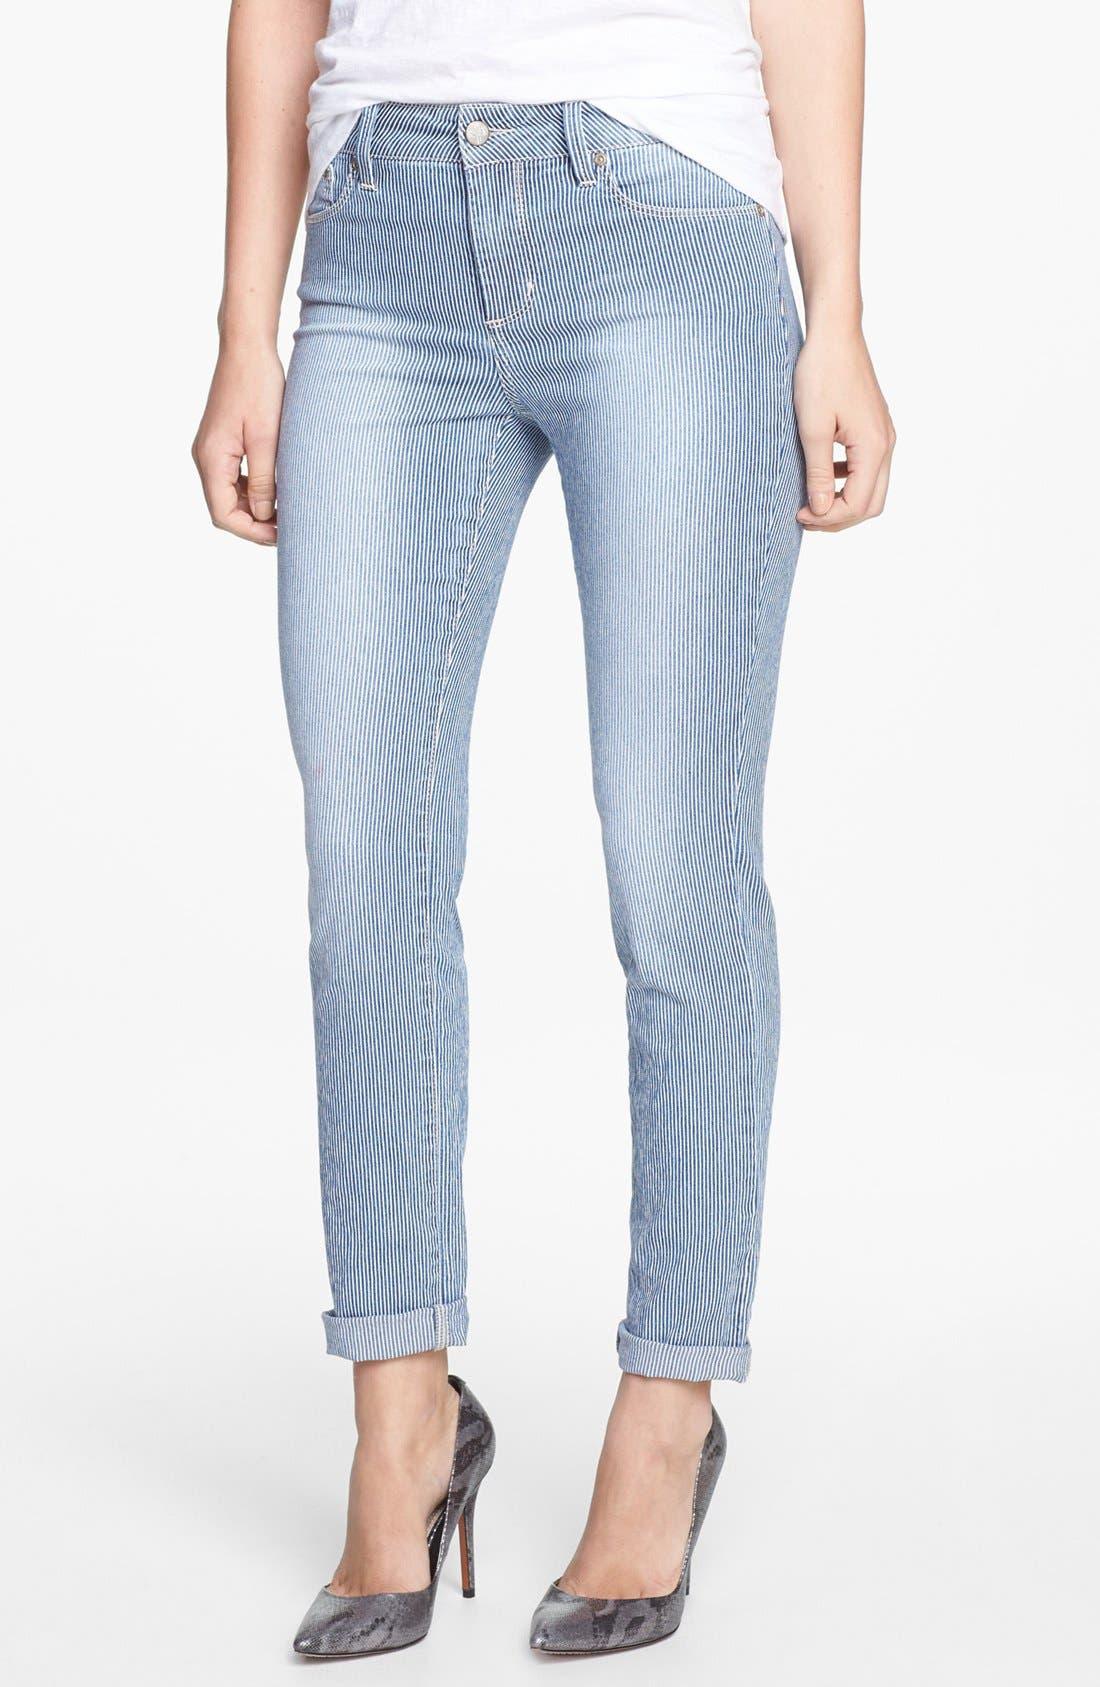 Alternate Image 1 Selected - NYDJ 'Leann' Stretch Skinny Boyfriend Jeans (Old West Stripe) (Petite)